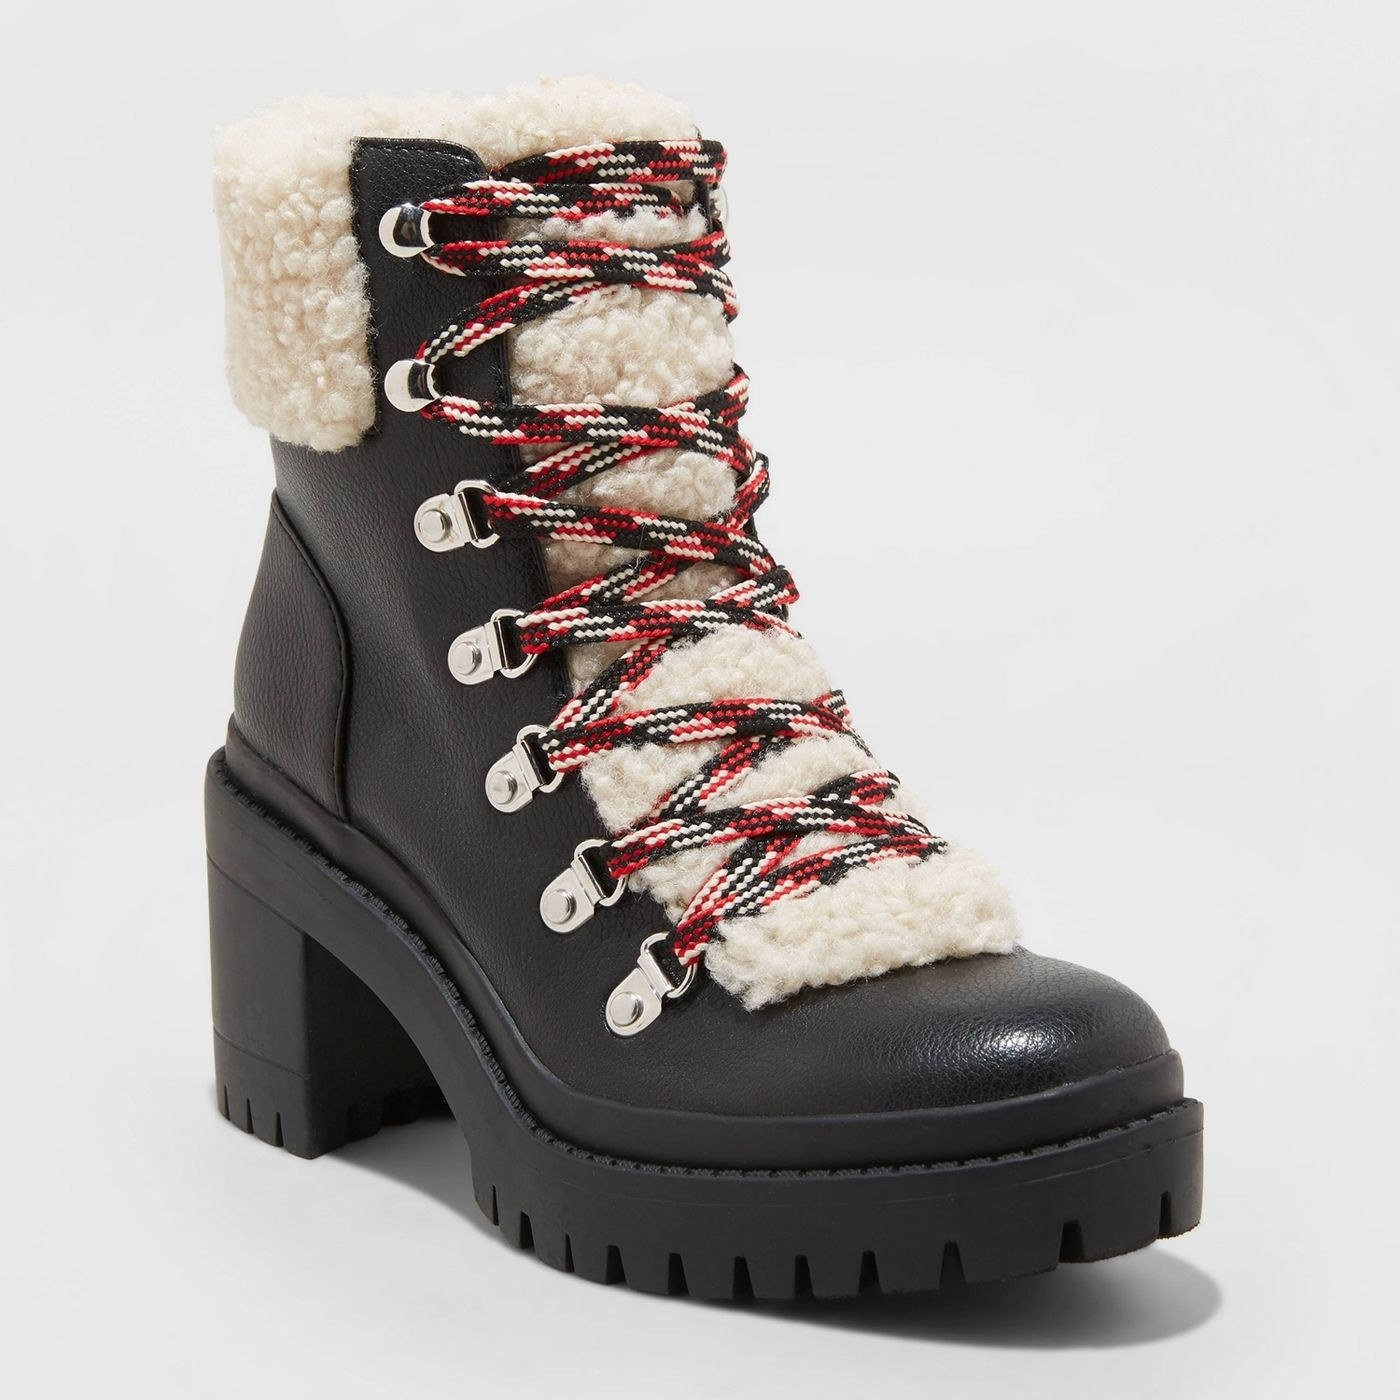 Heeled hiking boots